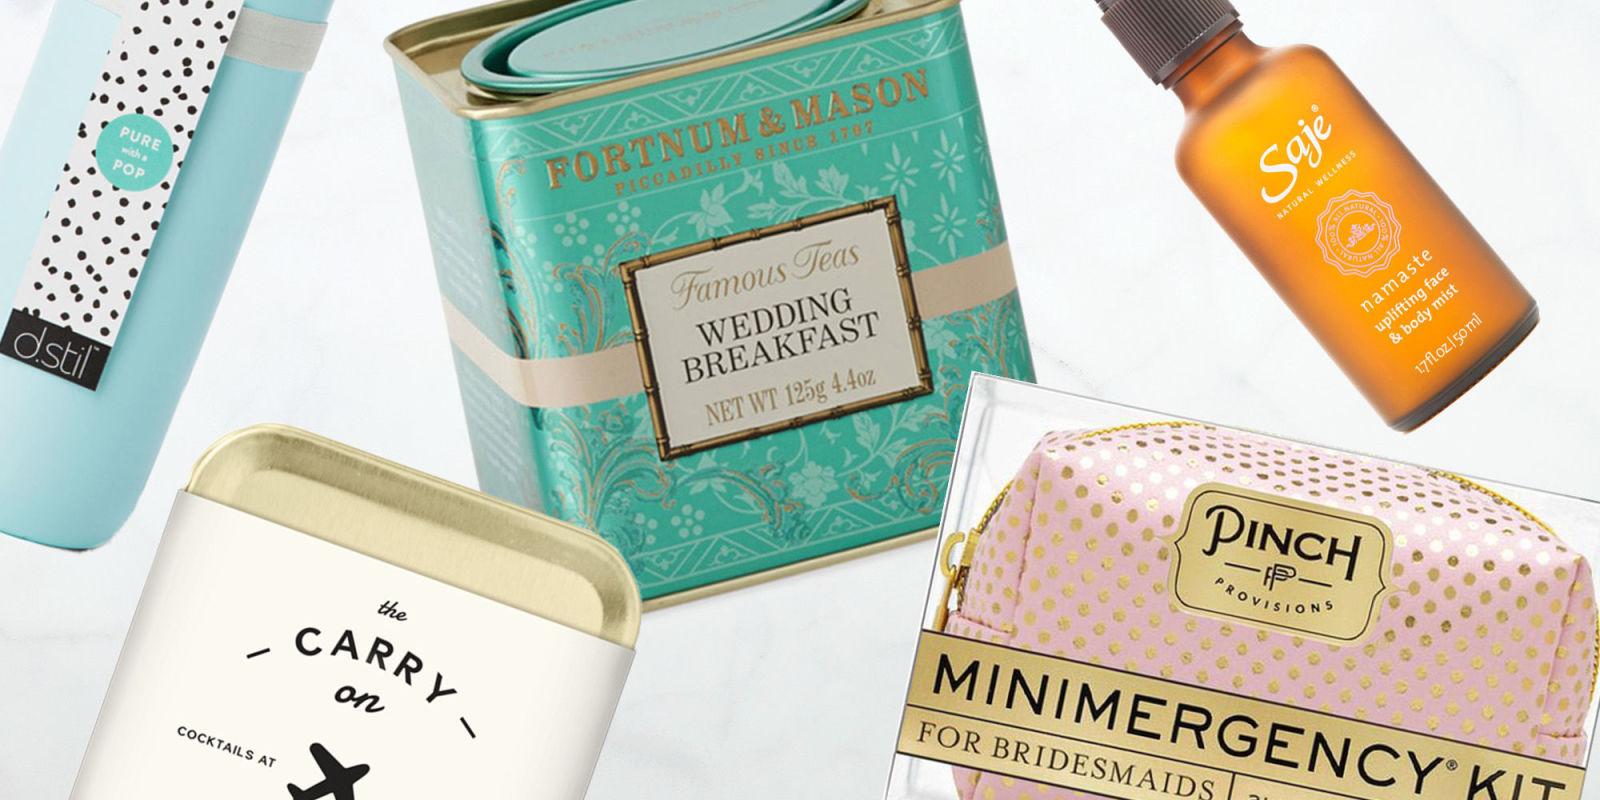 17 bridal shower party favor ideas unique bridal shower gifts for guests